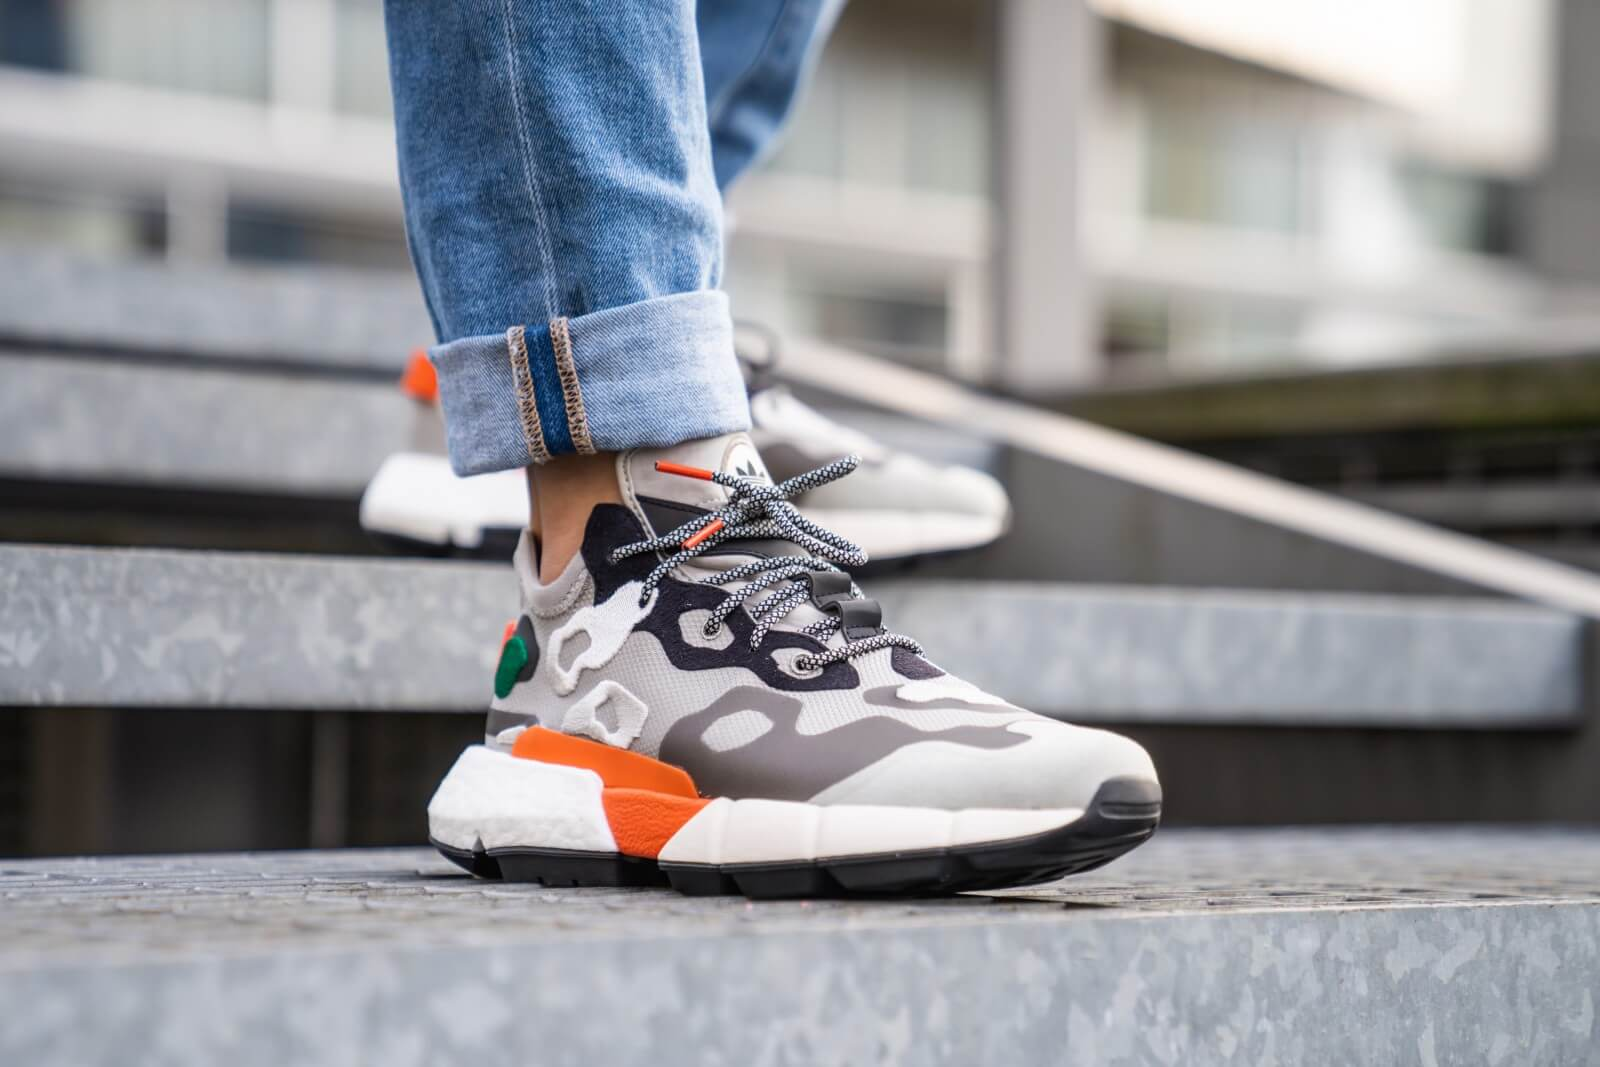 Adidas POD-S3.2 ML Sesame/Footwear